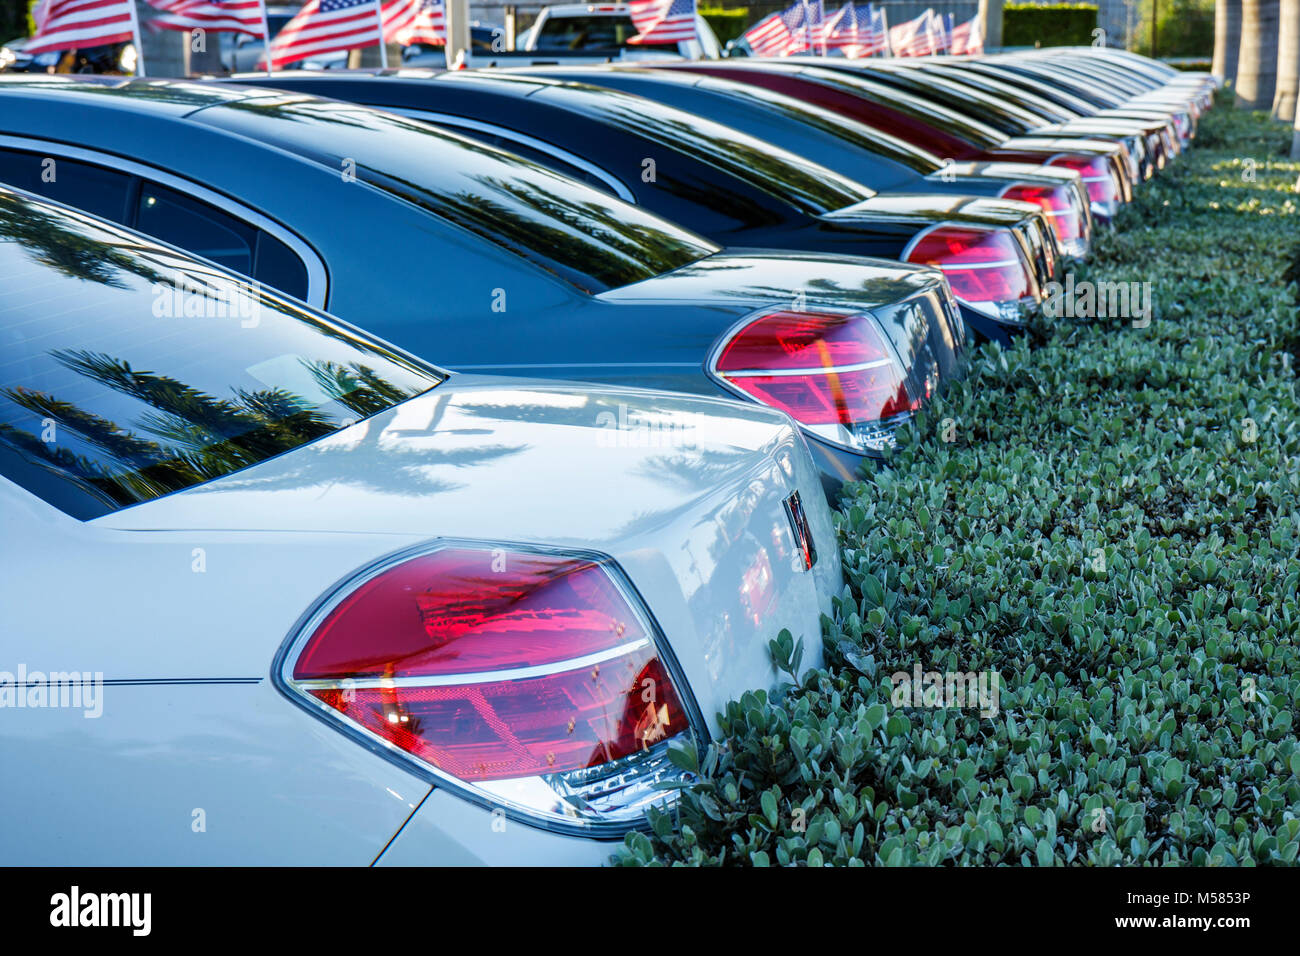 Miami GM General Motors Saturn Aura new car dealership lot automobile tail lights design - Stock Image